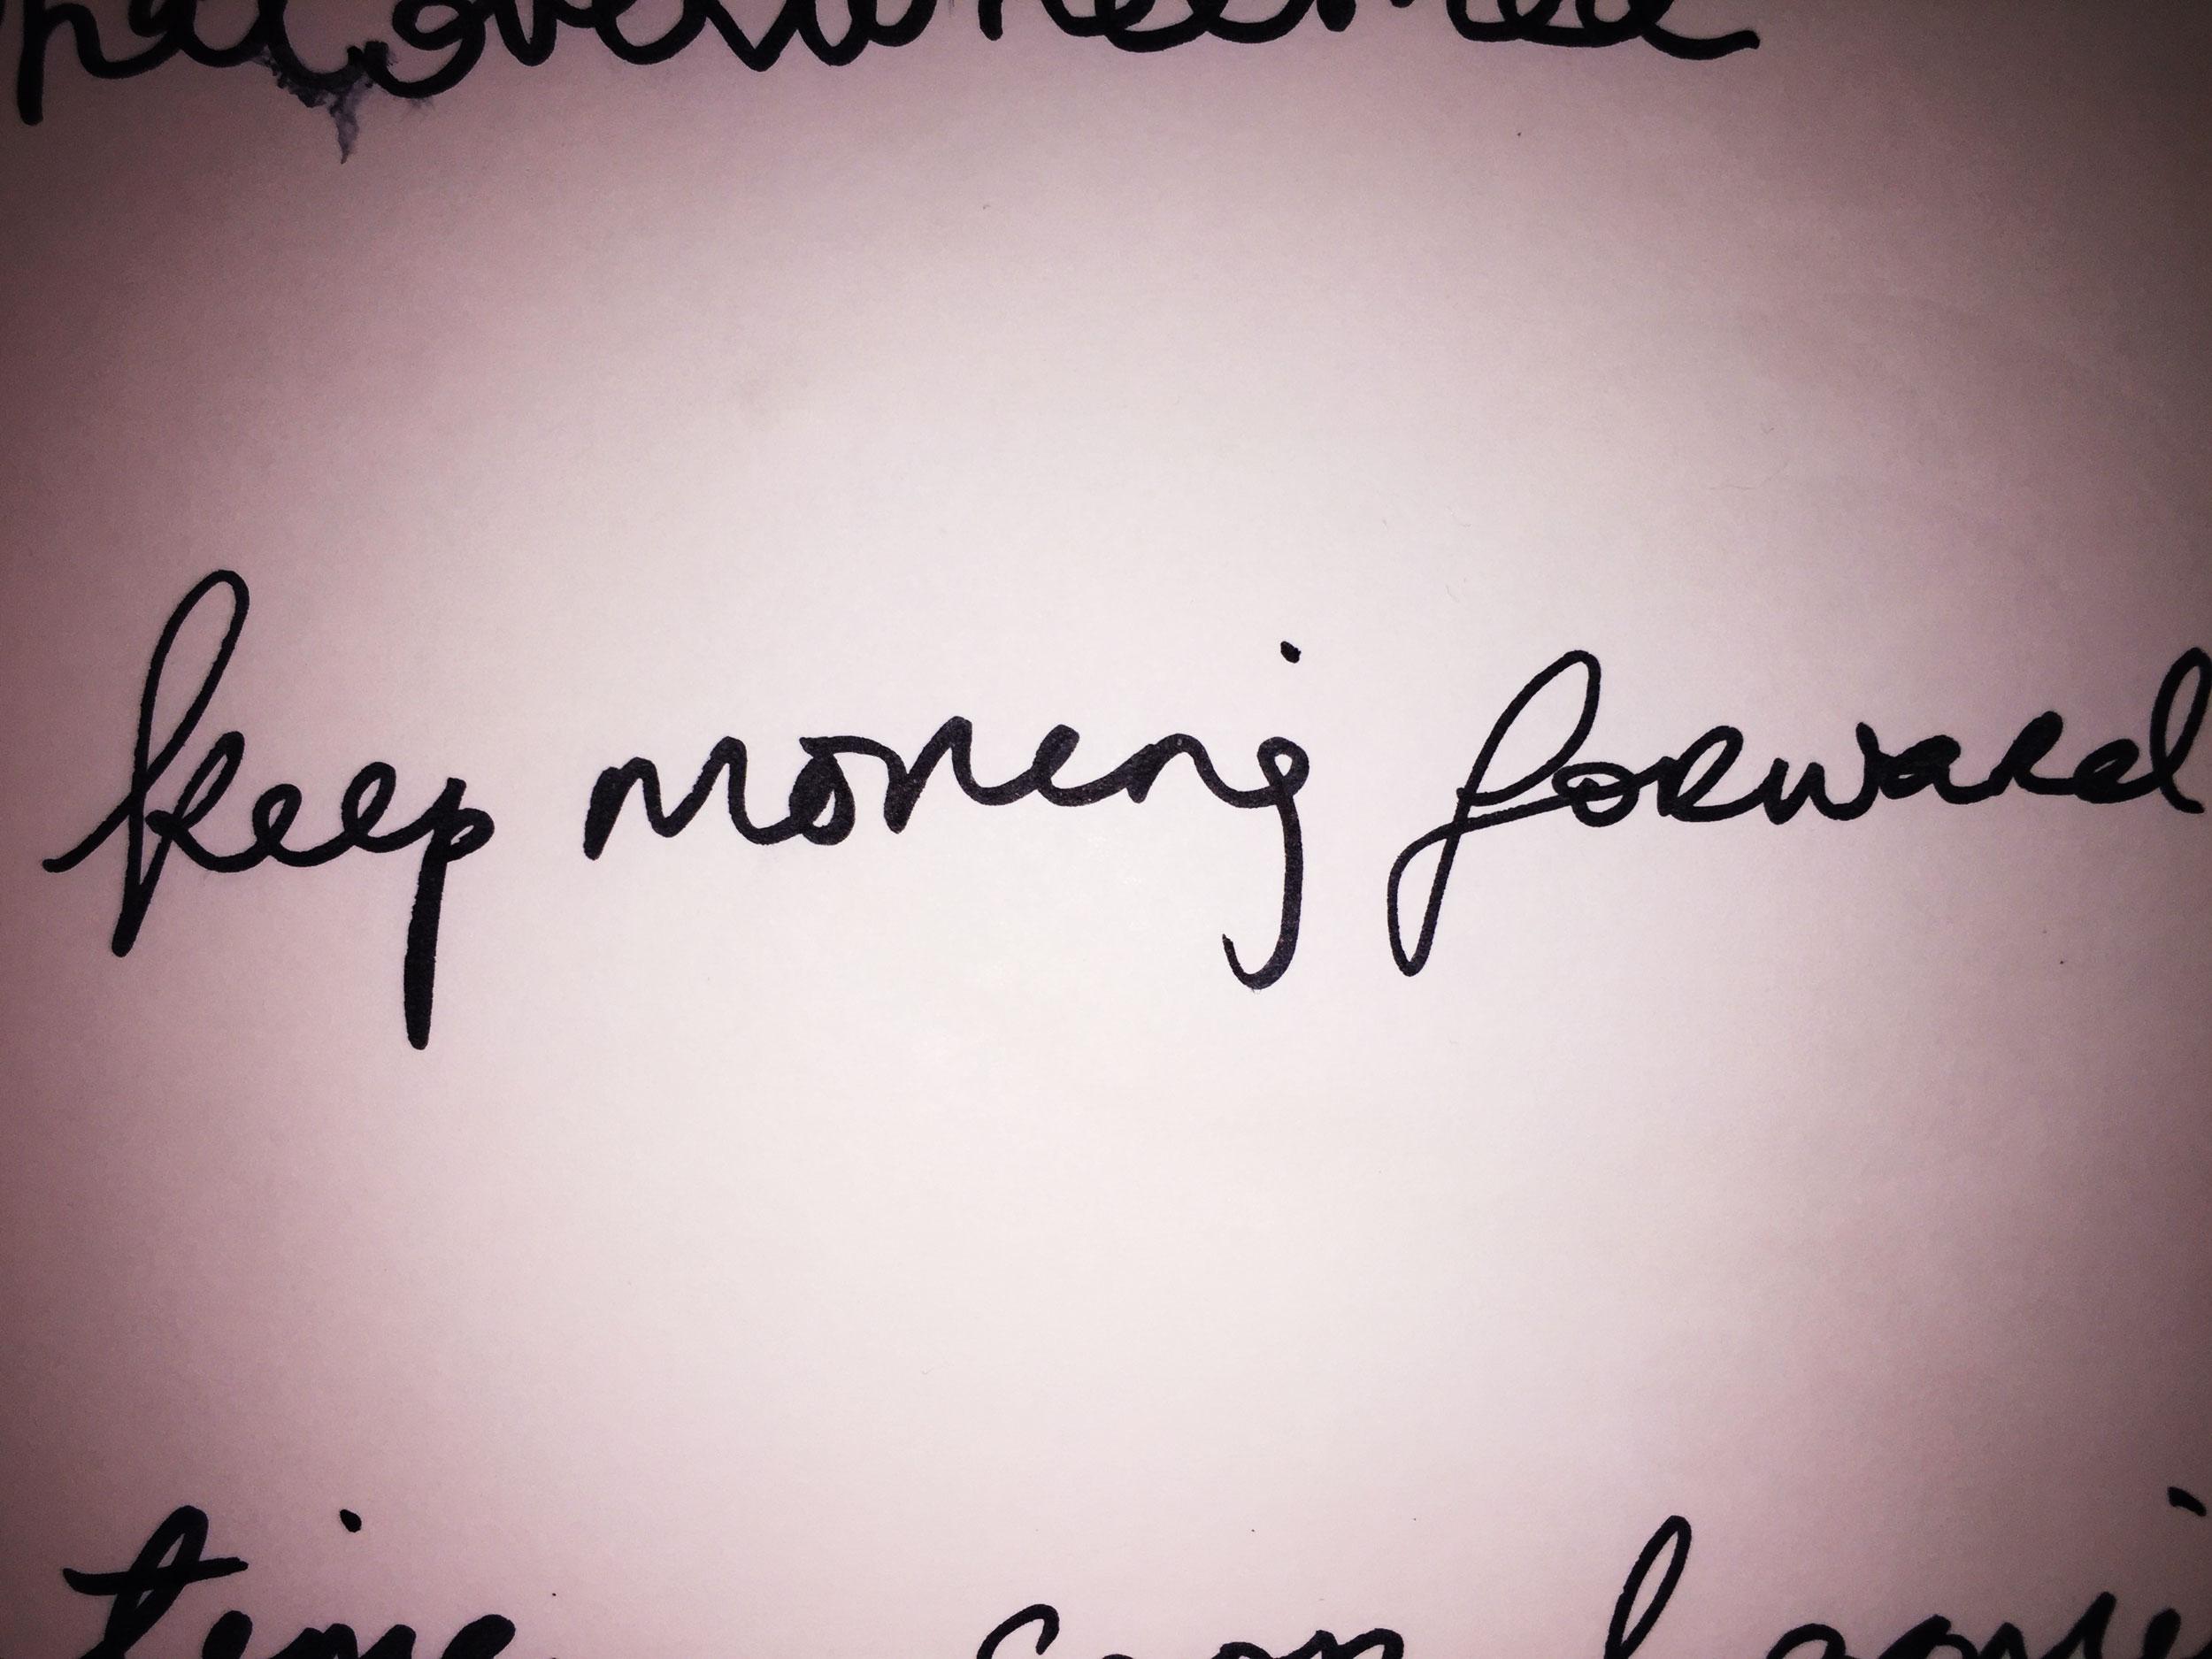 Keep moving forward. Drawing Luke Hockley.